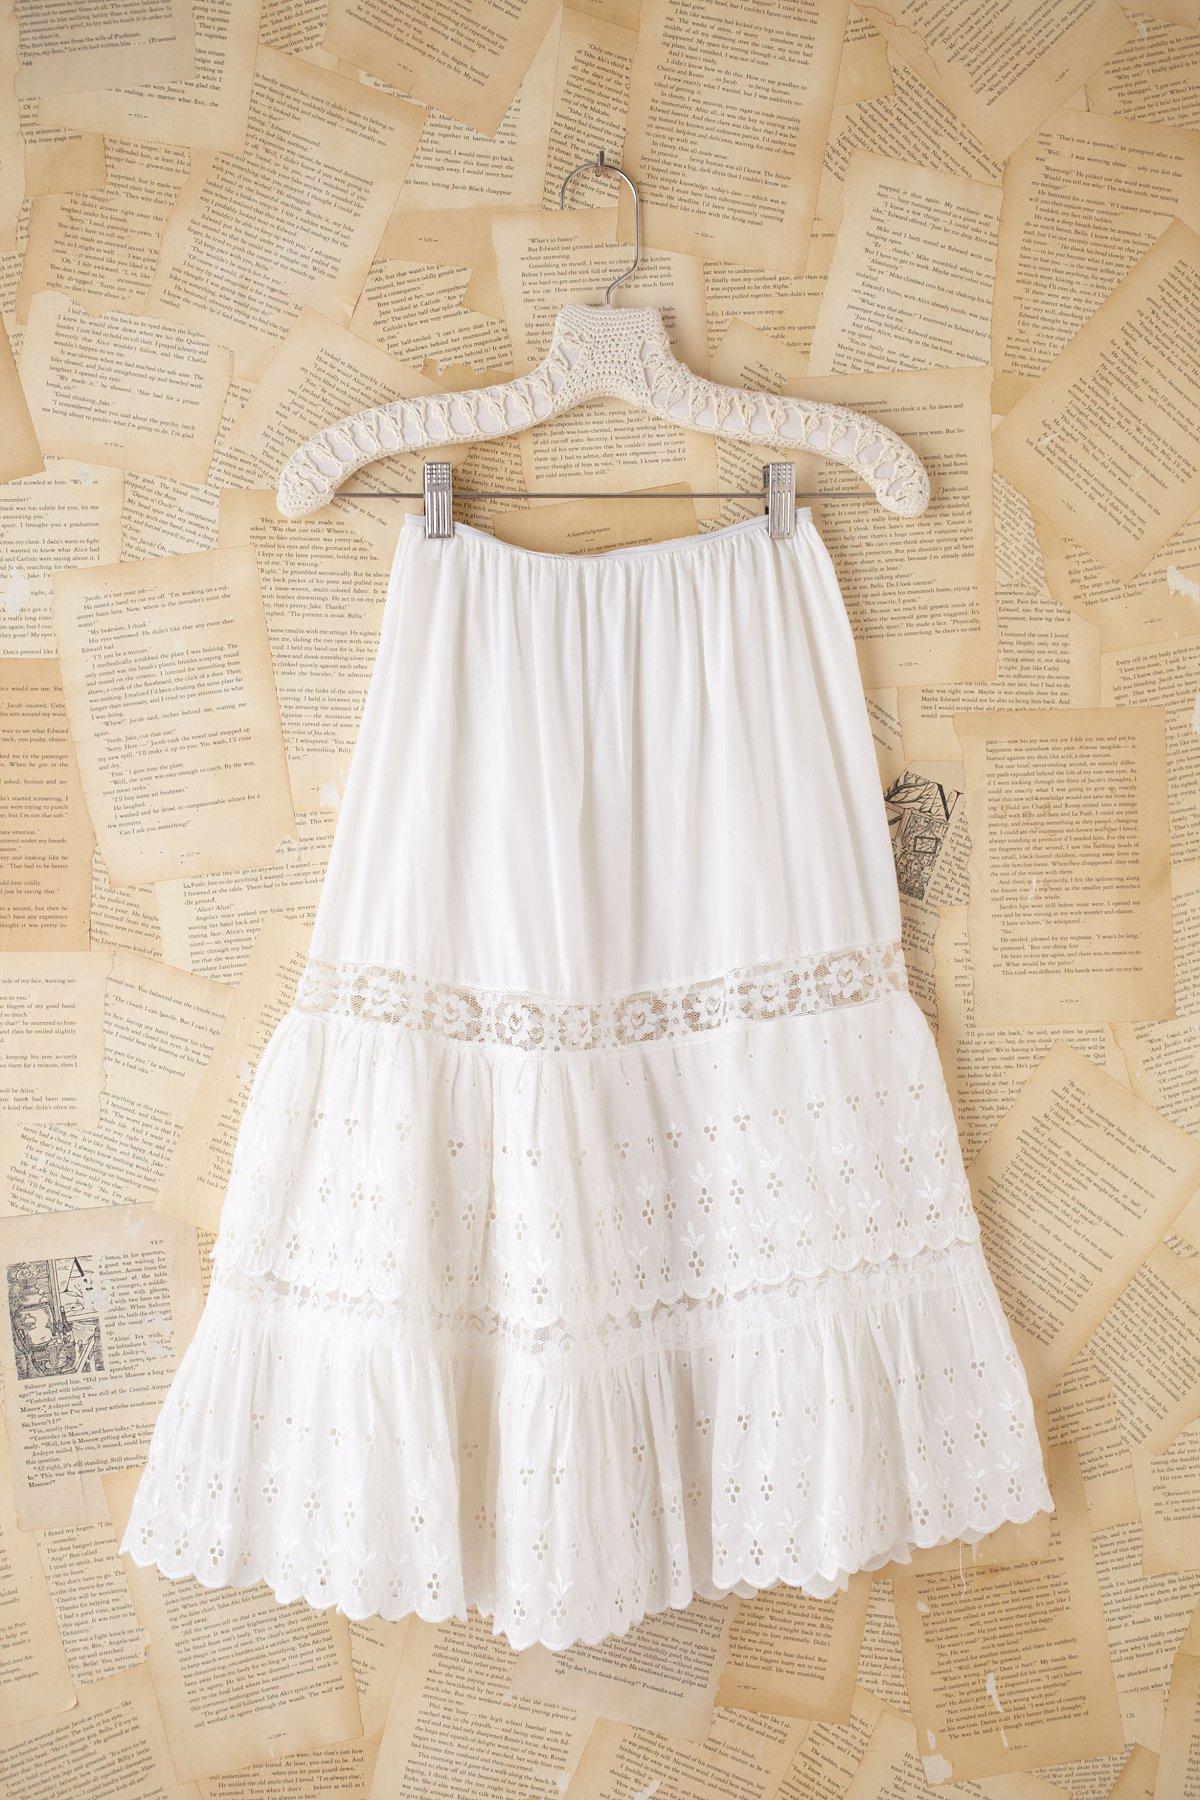 Vintage Eyelet Princess Skirt